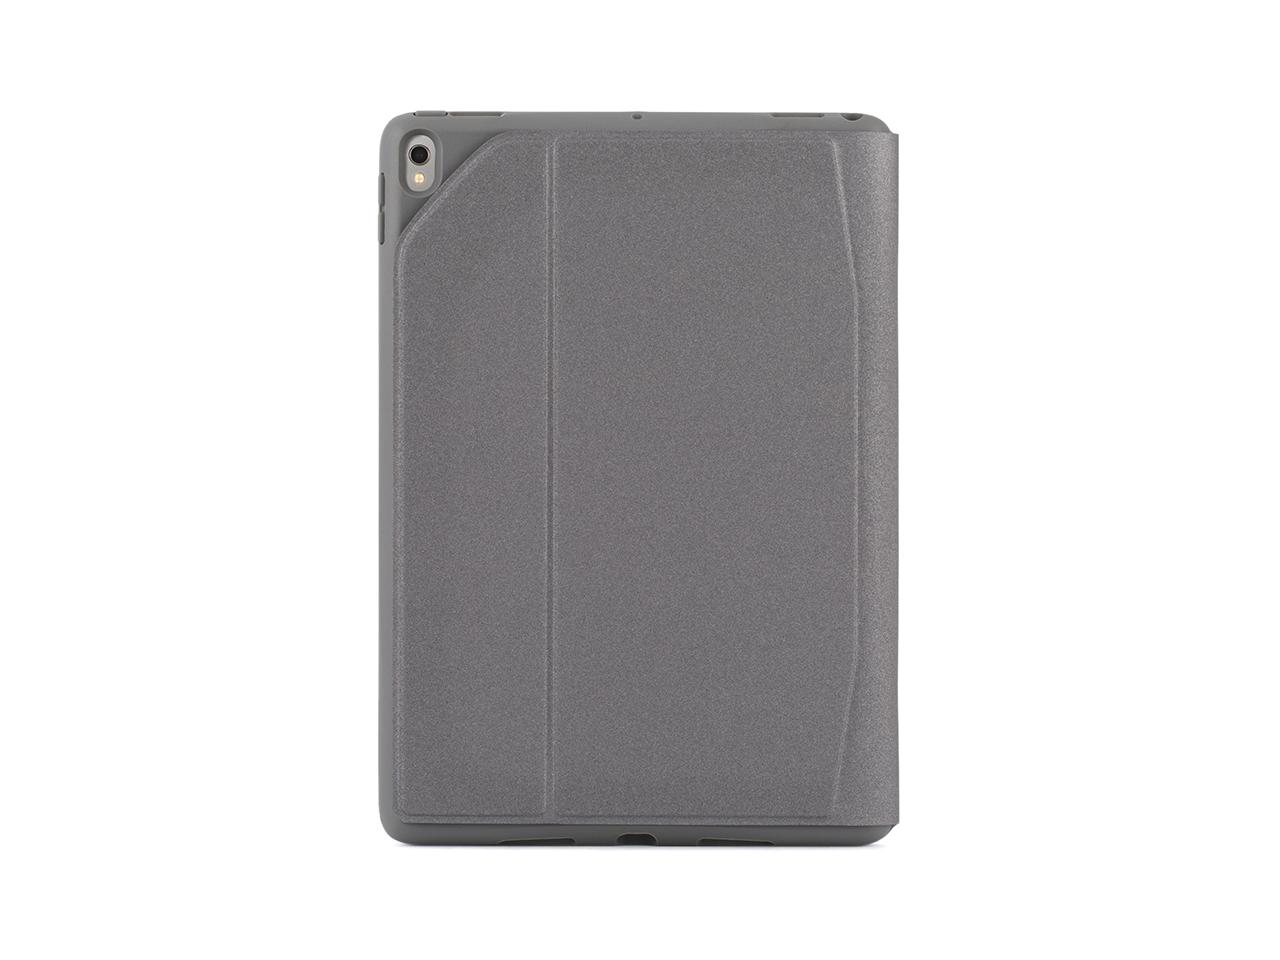 iPad Pro 10.5 Impact Resistant Folio